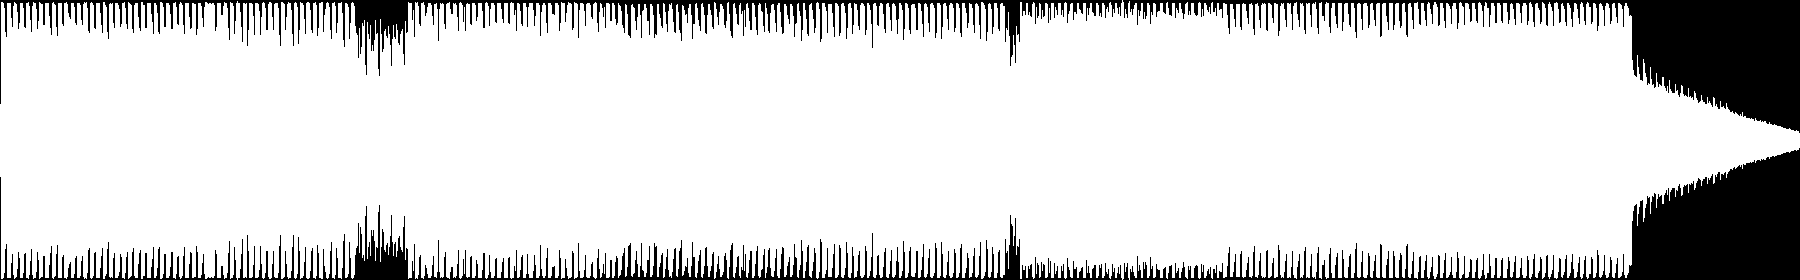 PURE TECHNO audio waveform